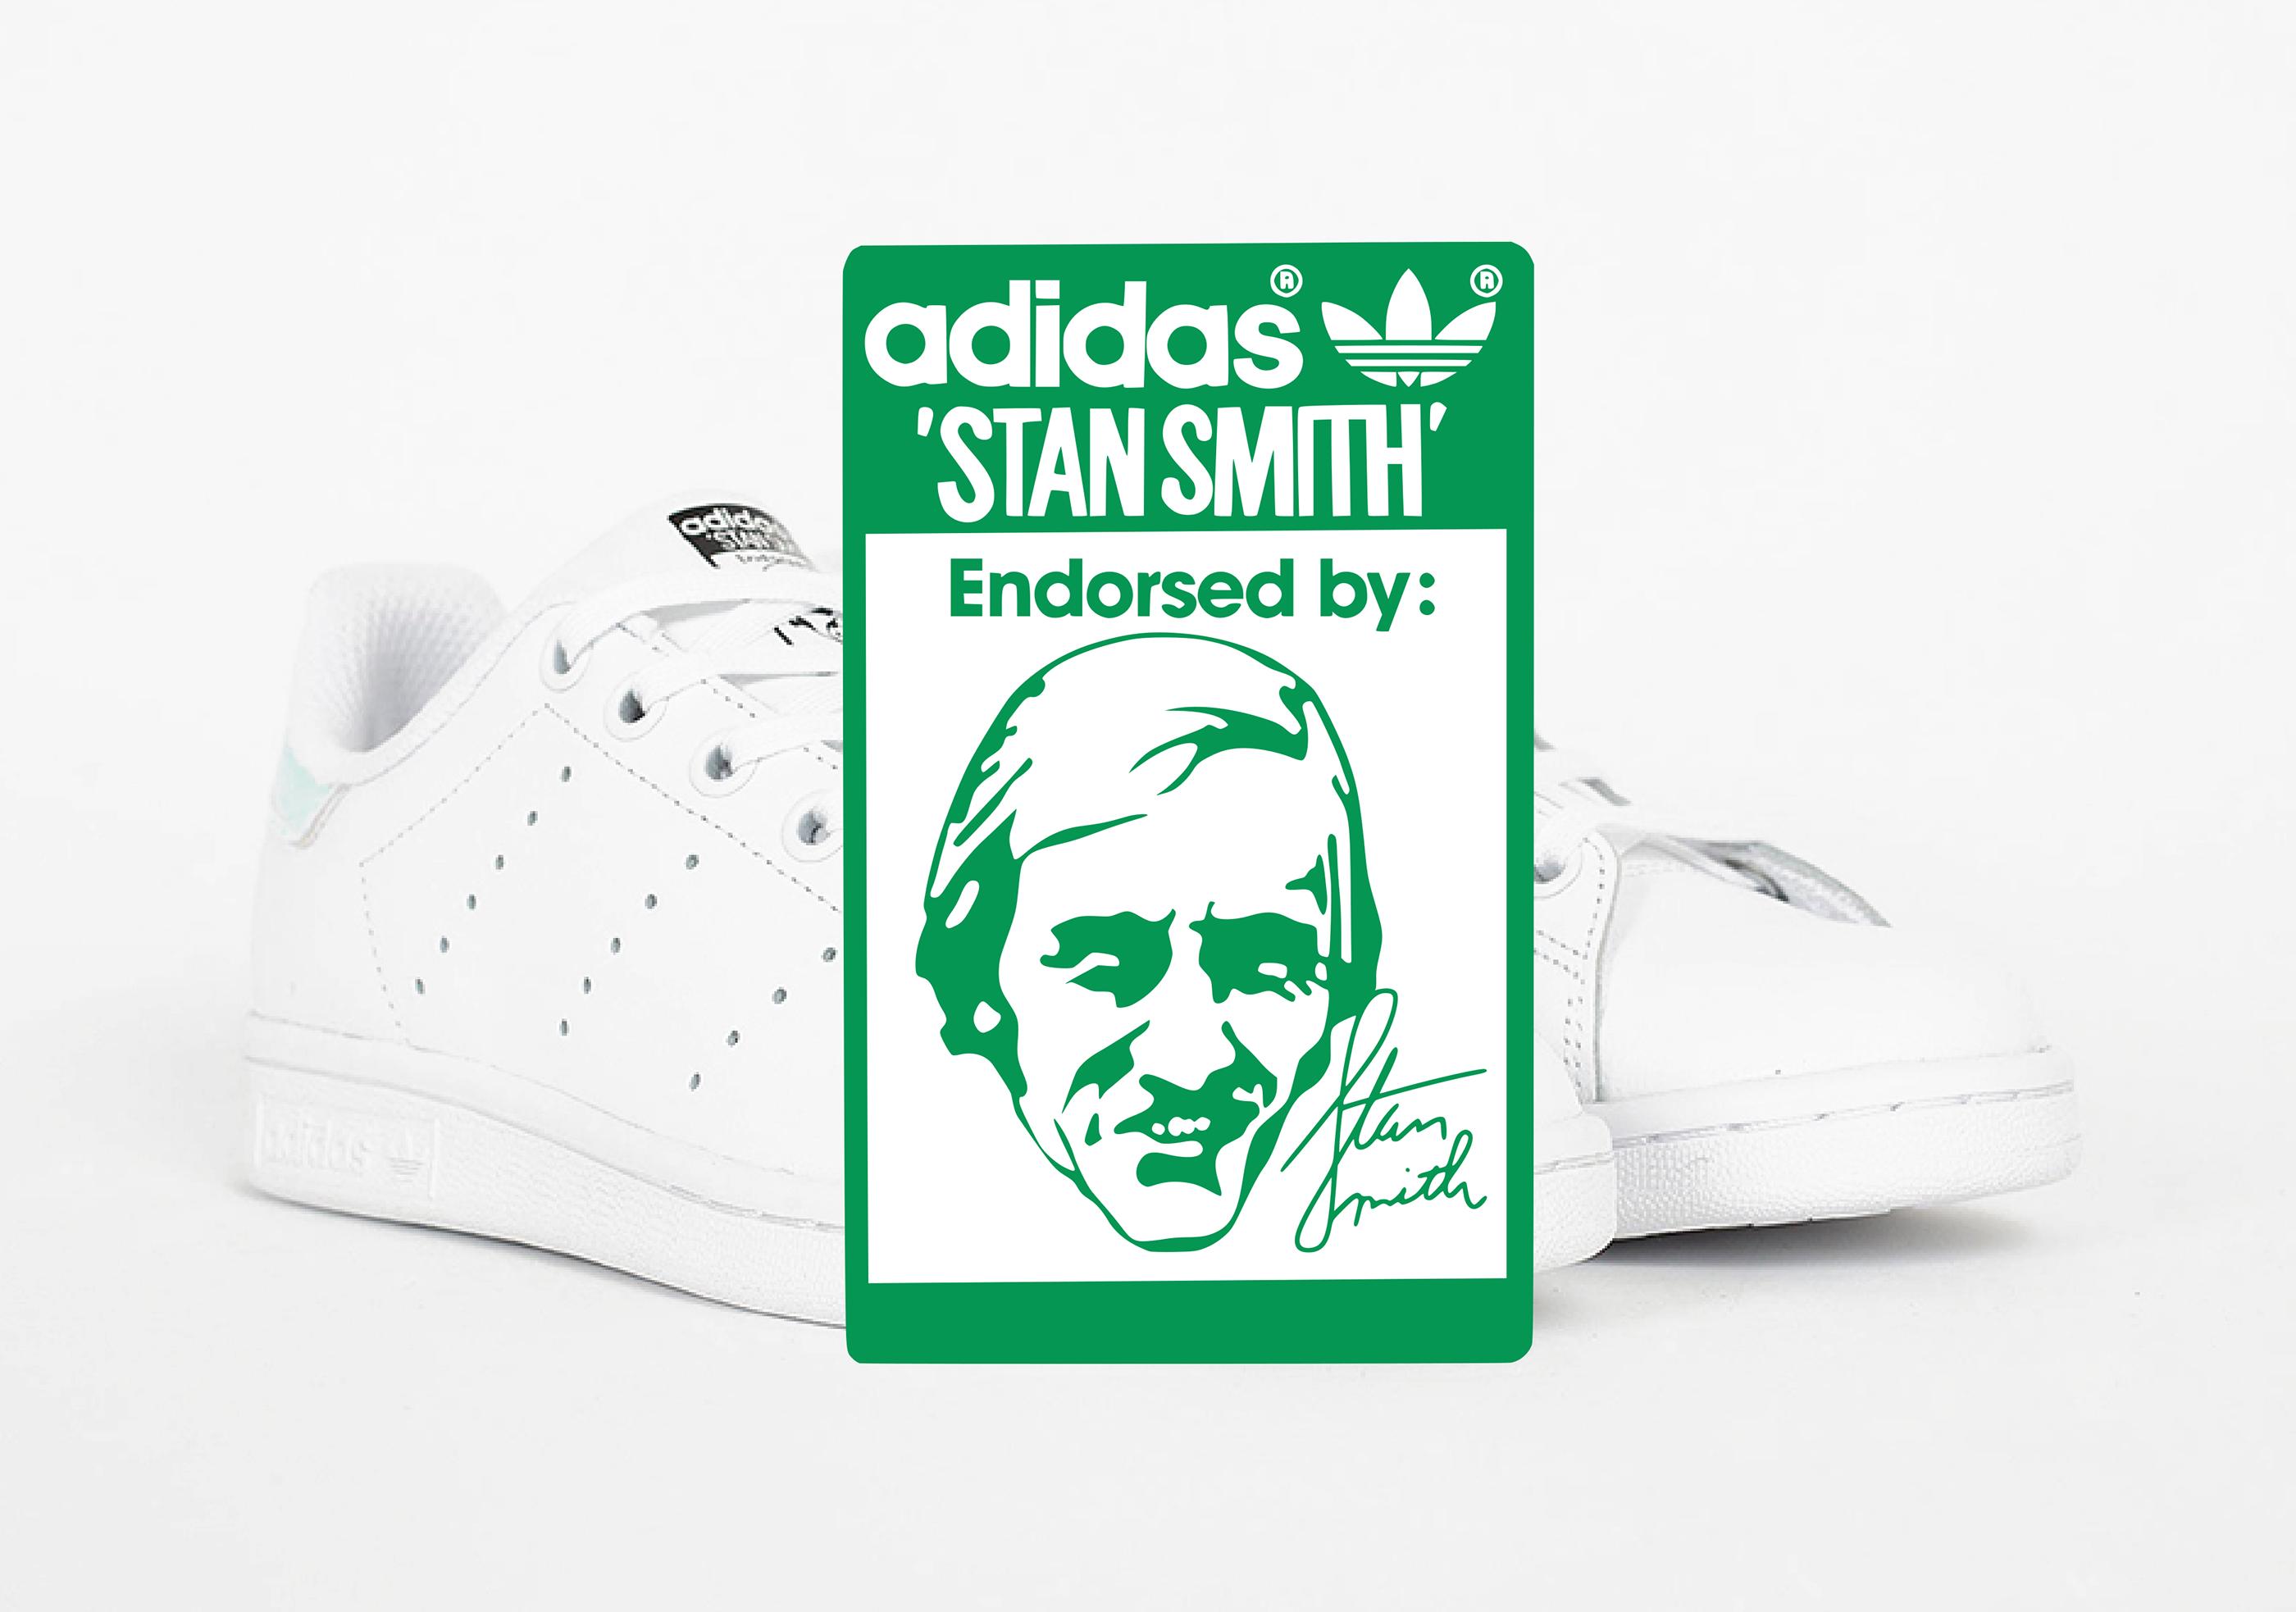 adidas stan smith 2016